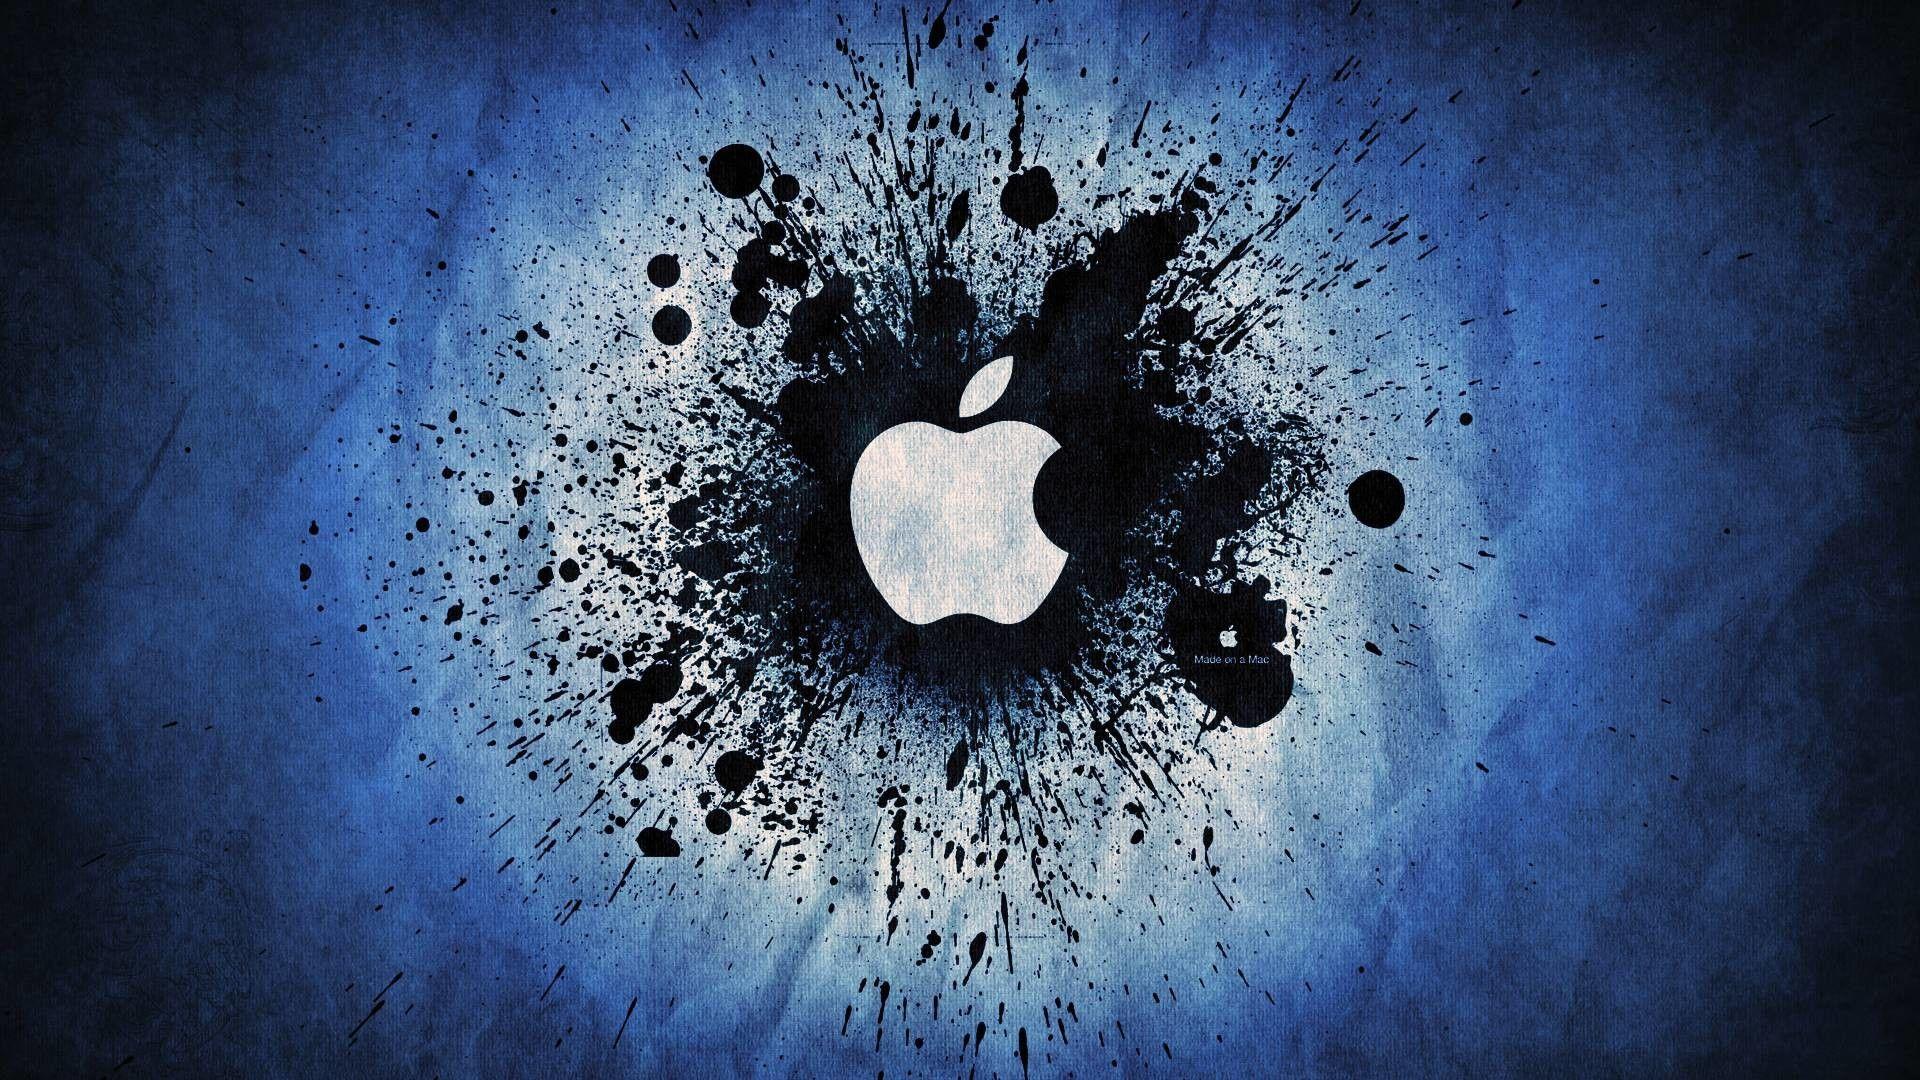 Posicionamiento de Apple